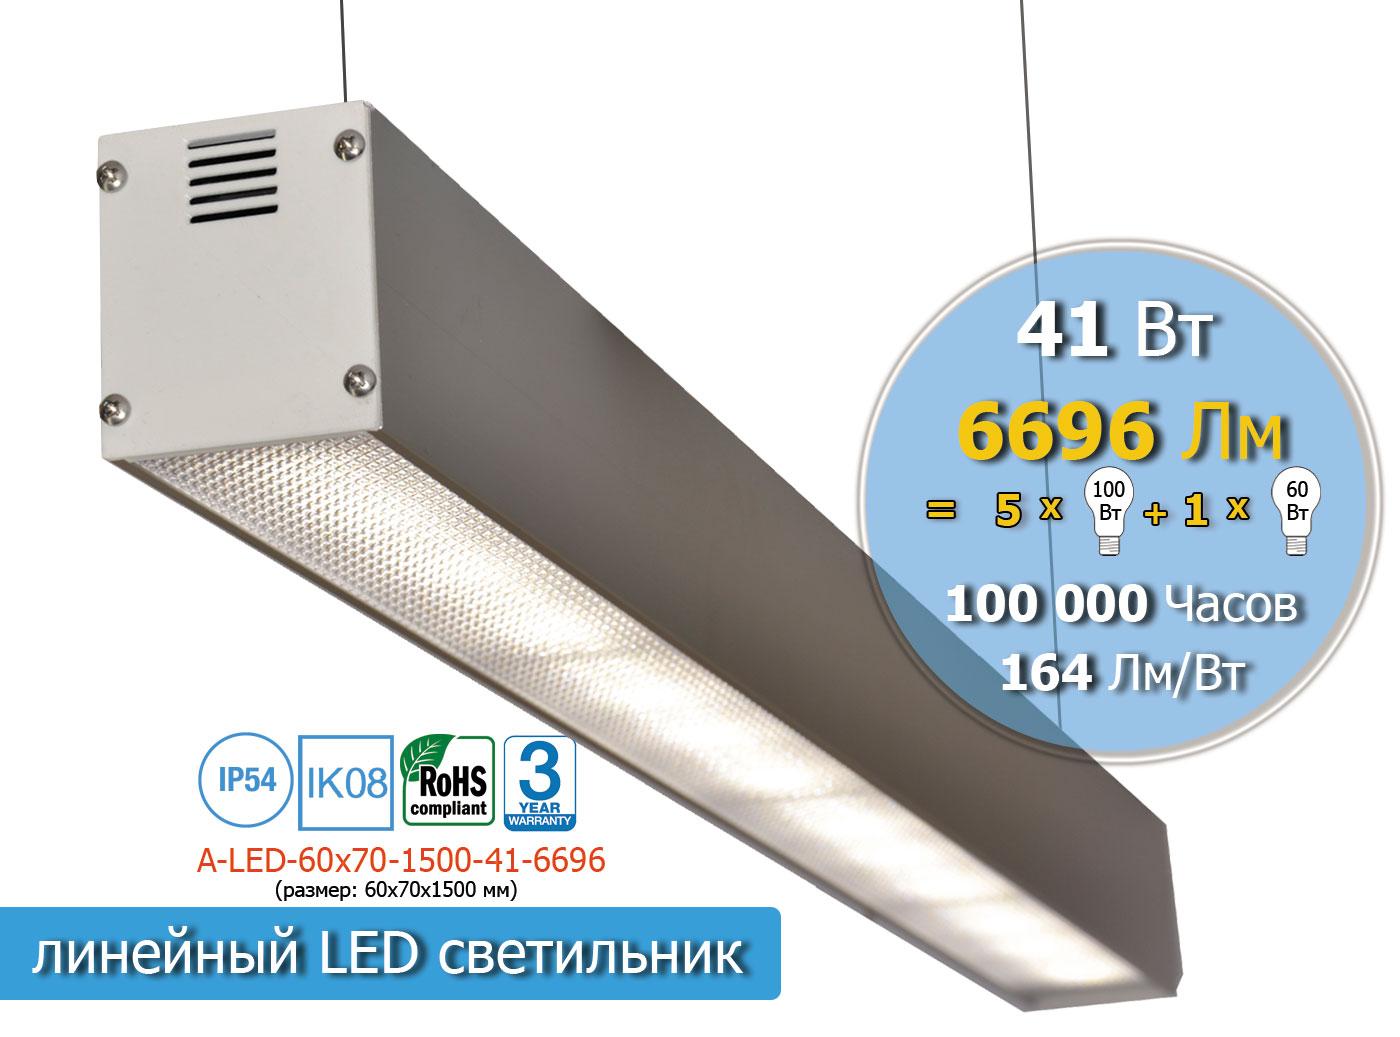 A-LED-60х70-1500-41-6696